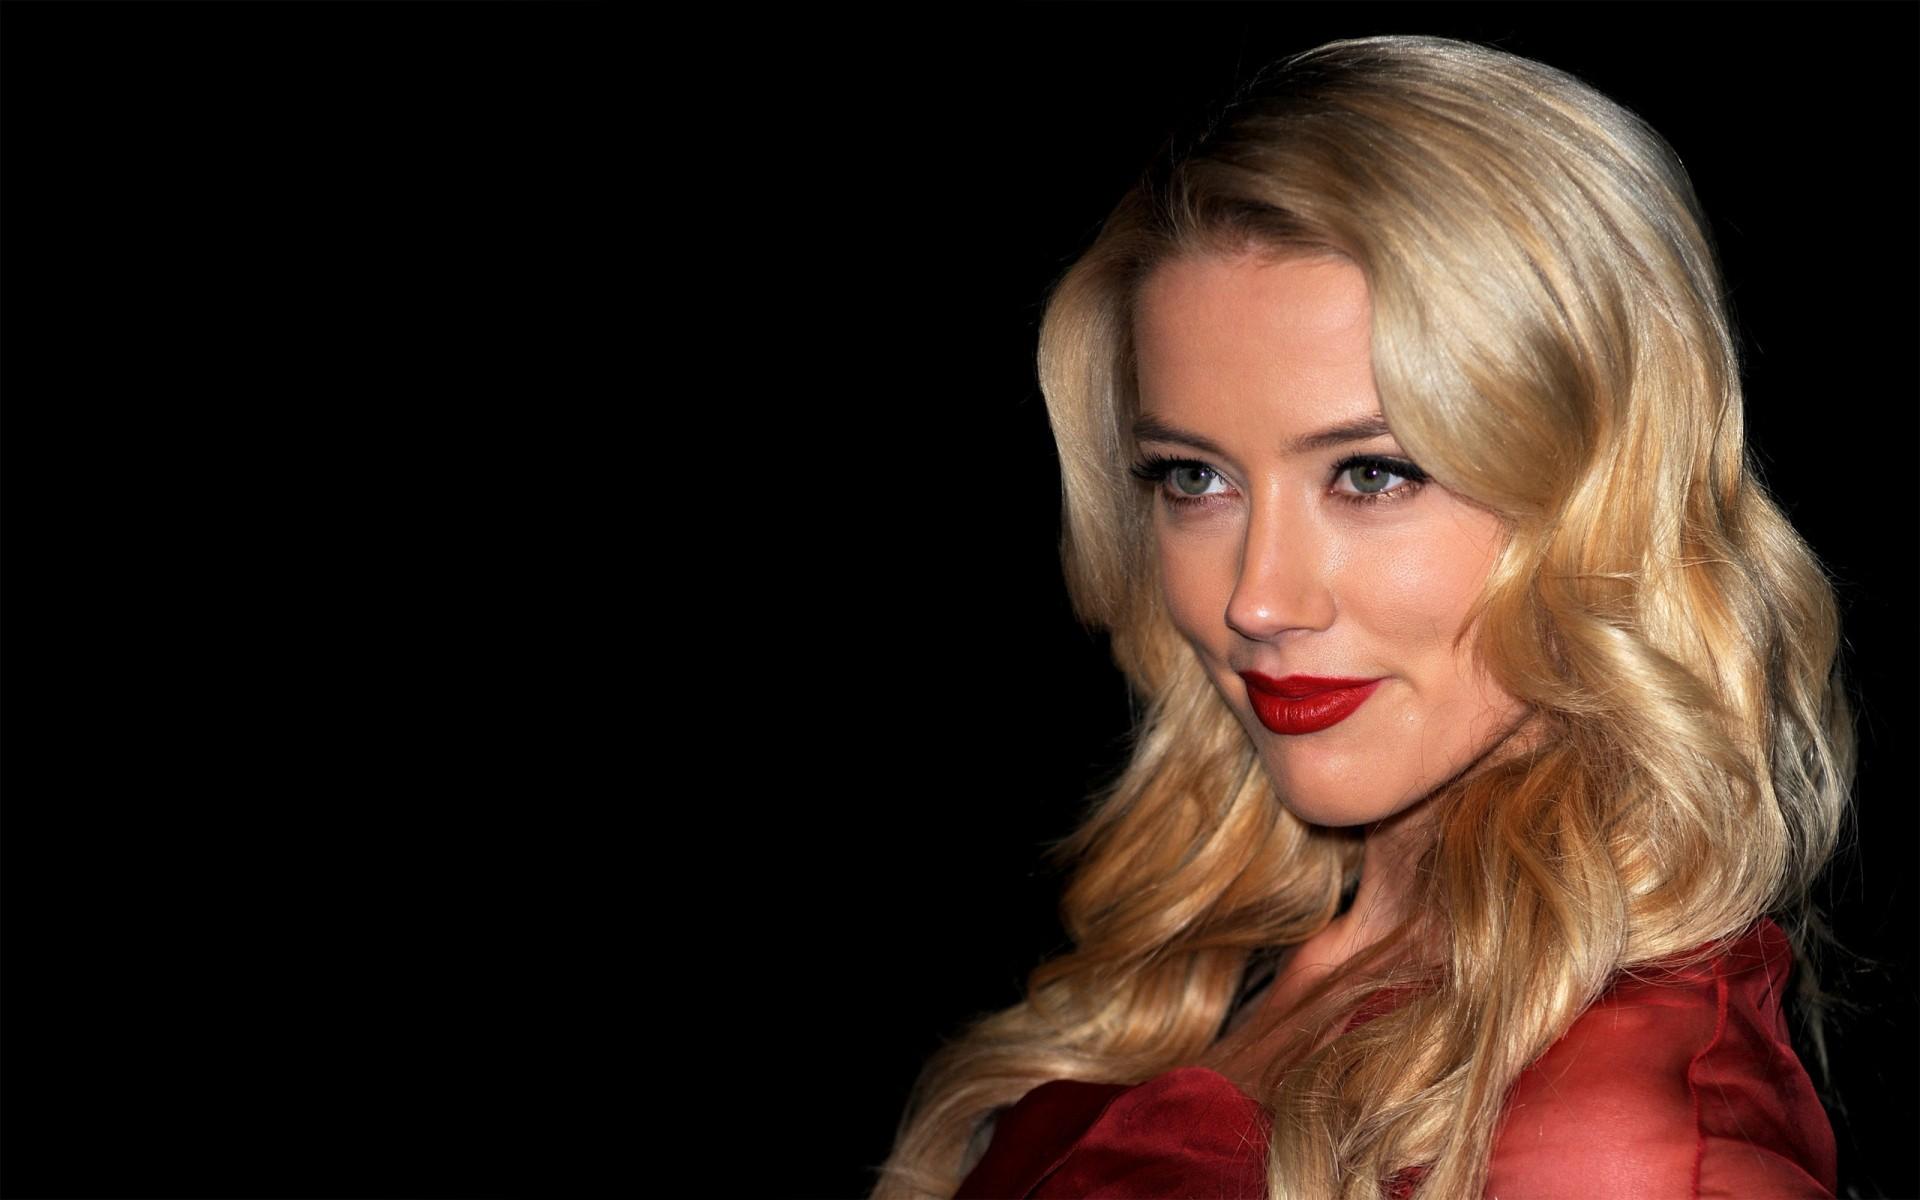 Amber Heard Hd - Amber Heard Lips , HD Wallpaper & Backgrounds